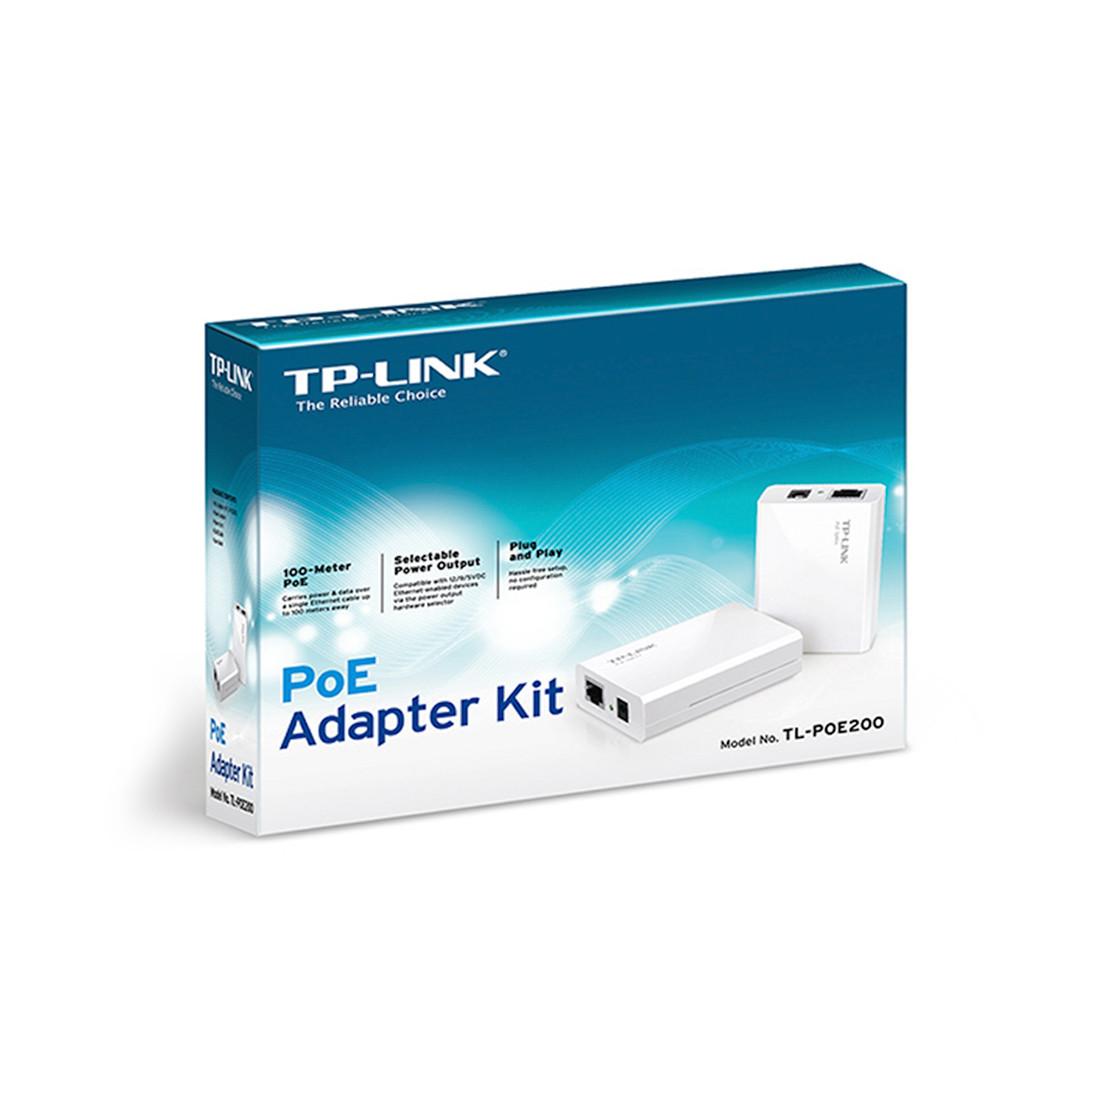 Комплект PoE инжектор + сплиттер TP-Link TL-POE200